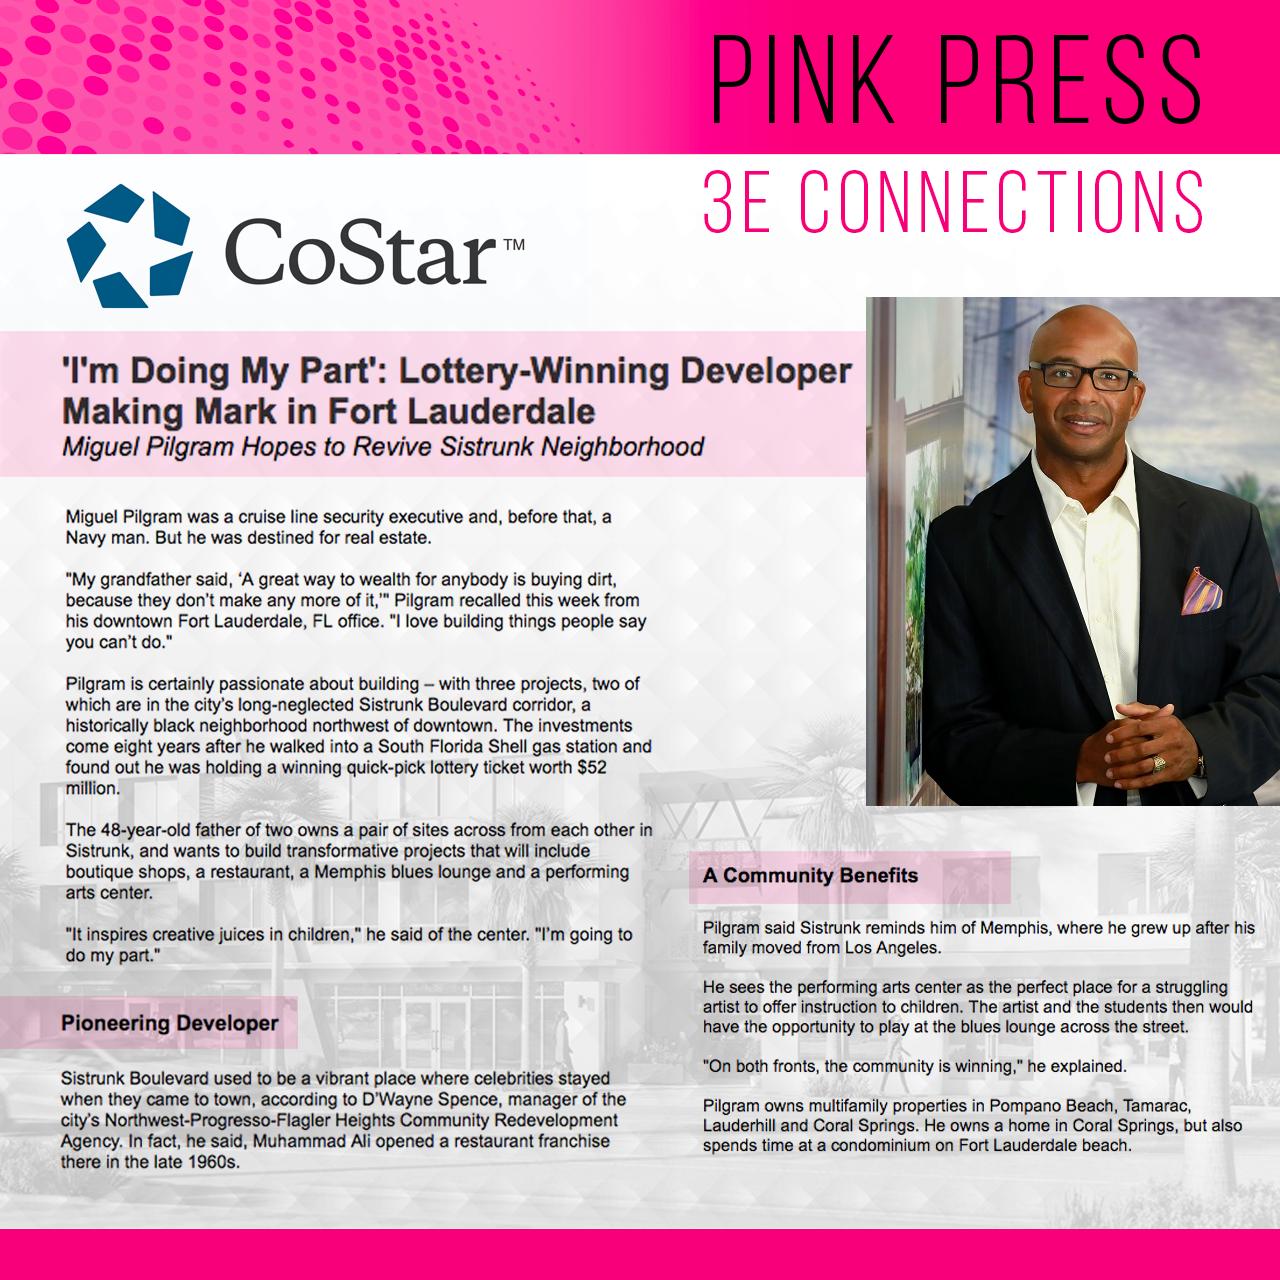 PinkPress_CoStar.png